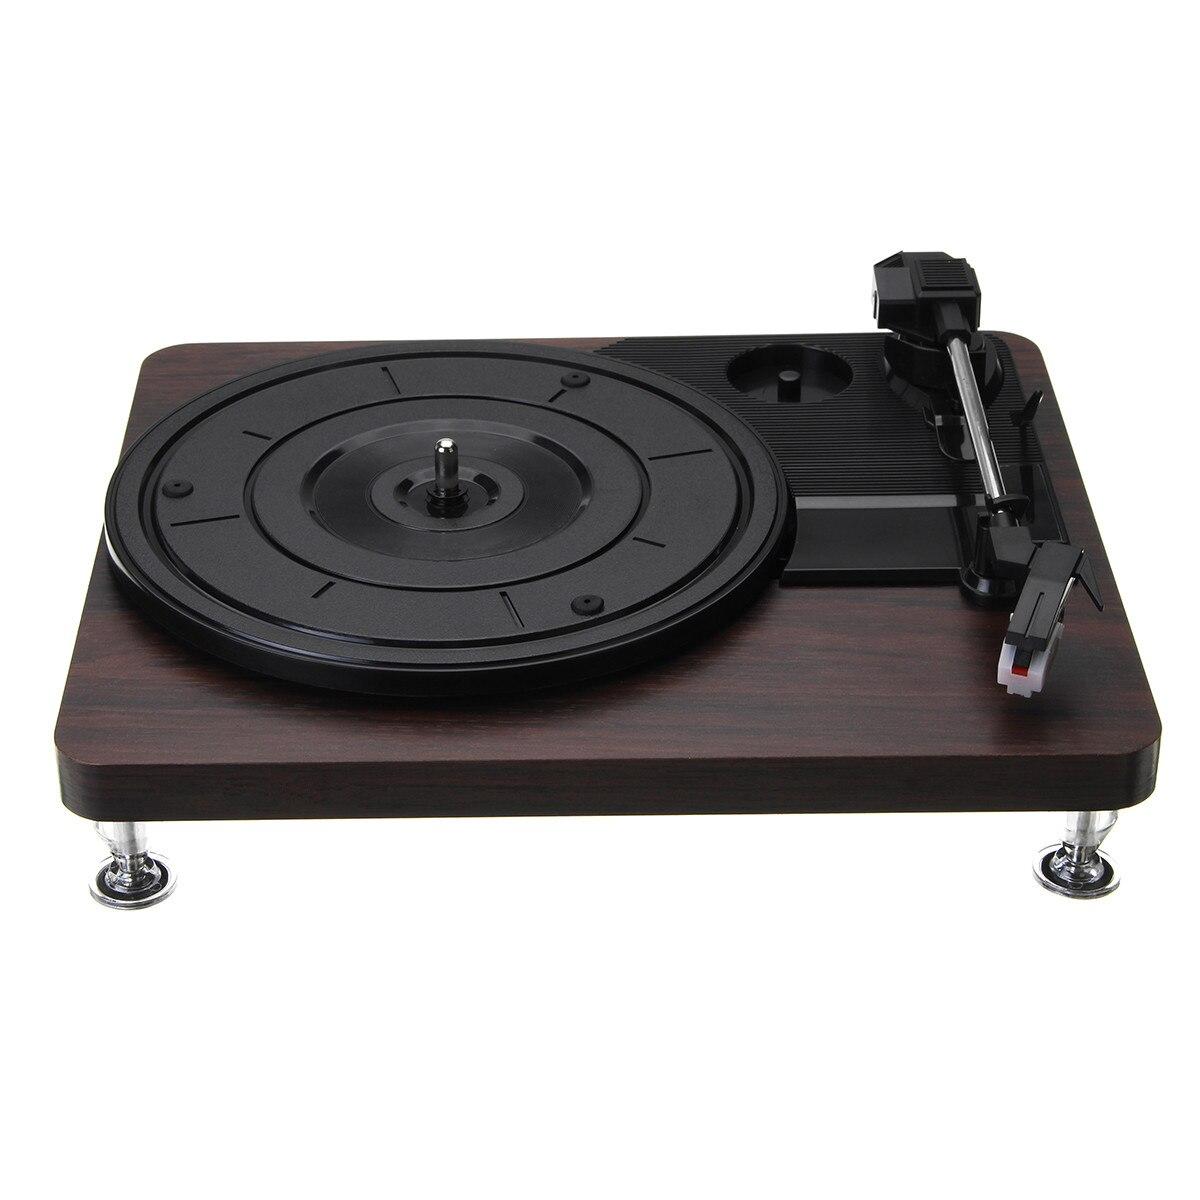 Plattenspieler Unterhaltungselektronik 33 Rpm Kunststoff Rekord Retro Player Portable Audio Grammophon Plattenspieler Disc Vinyl Audio Rca R/l 3,5 Mm Ausgang Out Usb Dc 5 V